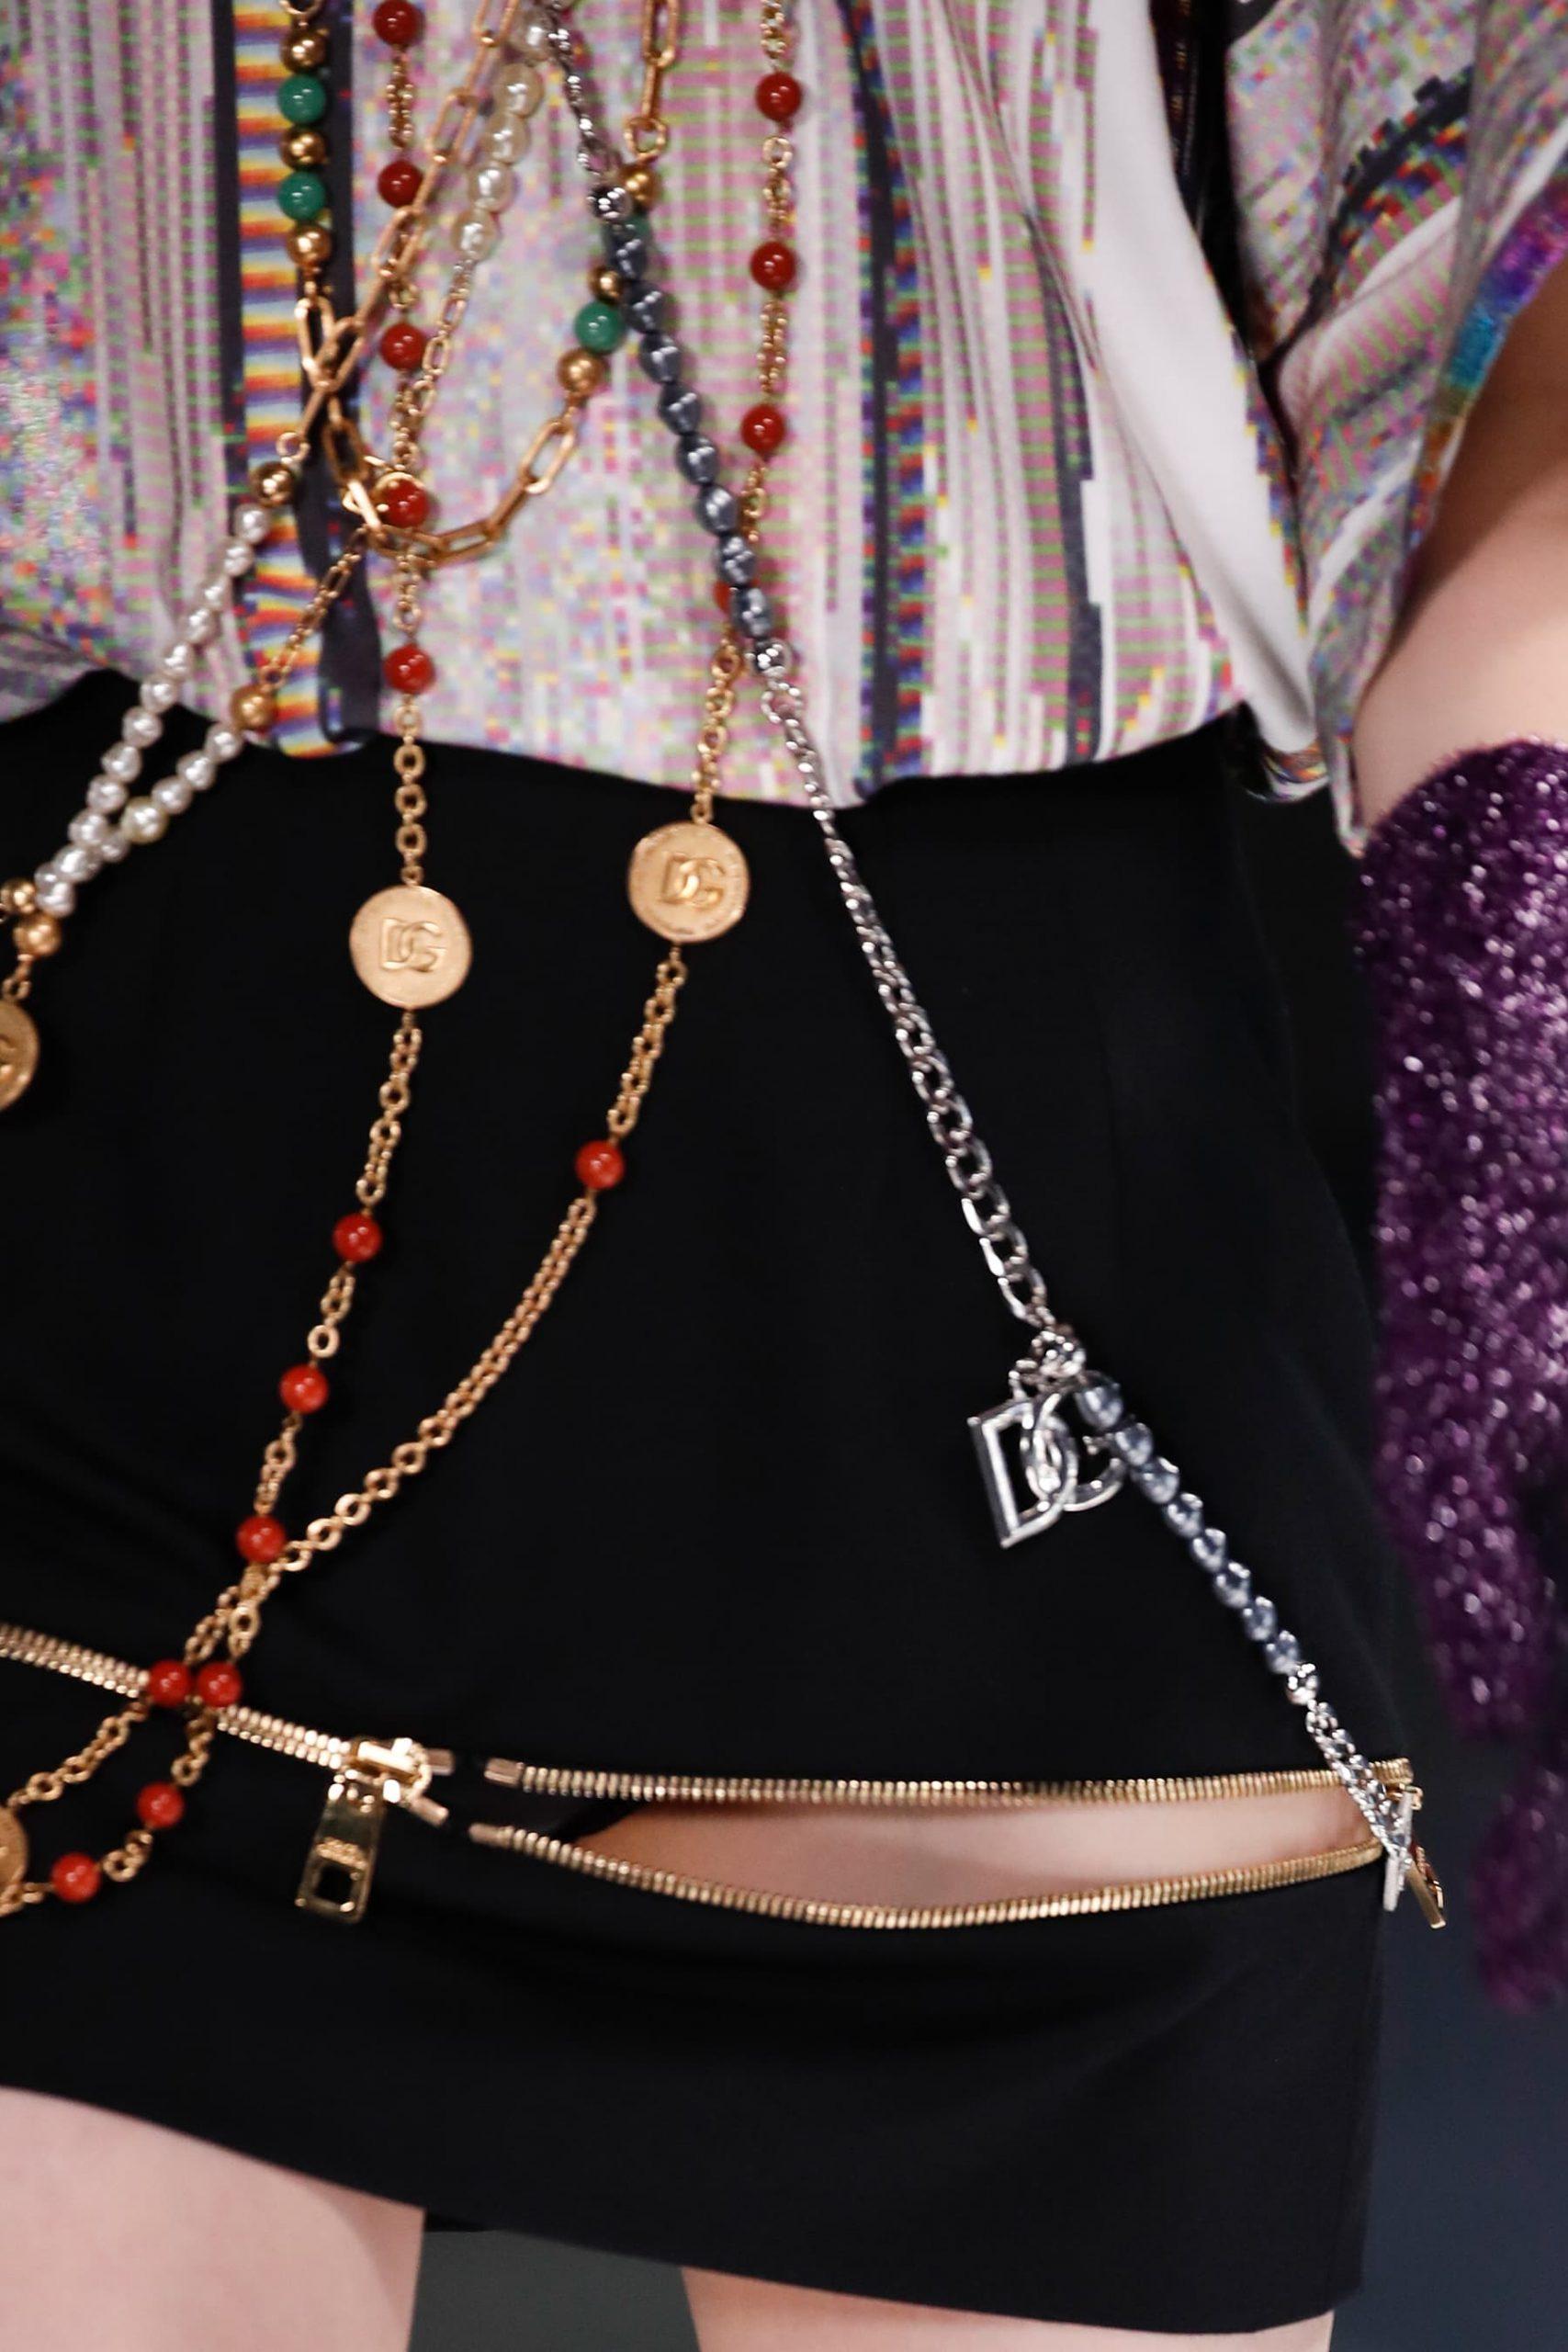 Dolce & Gabbana Fall 2021 Fashion Show Accessories